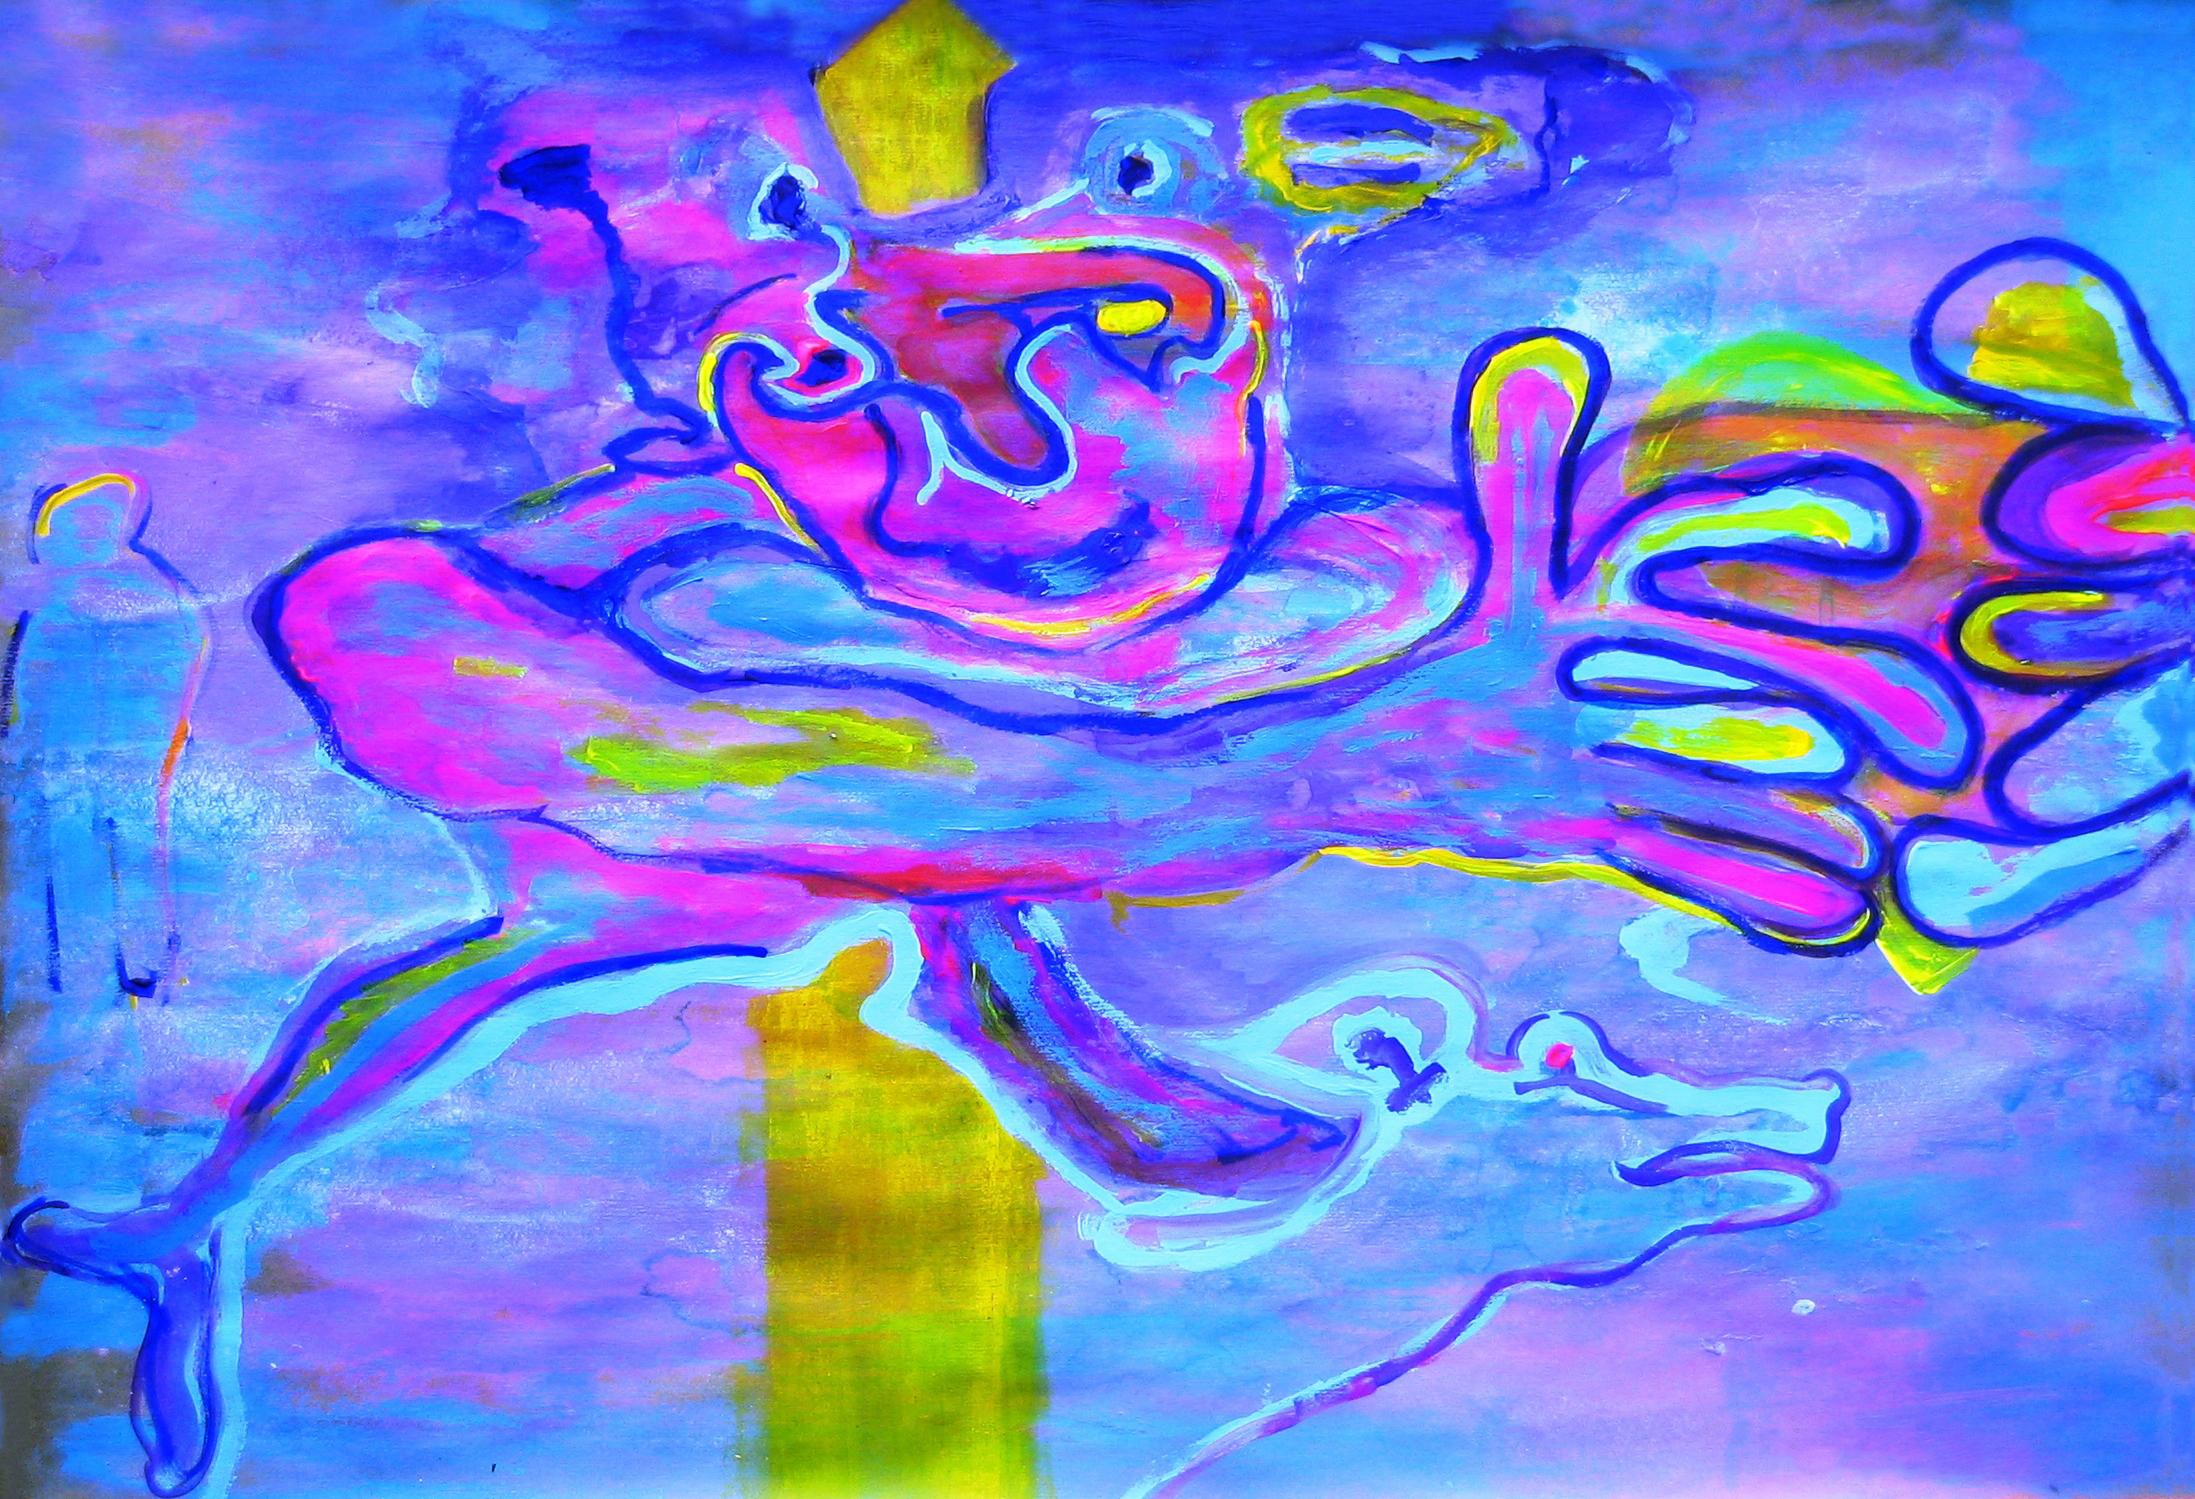 Cuor contento_Tecnica mista su tavola_ cma 60 x 85